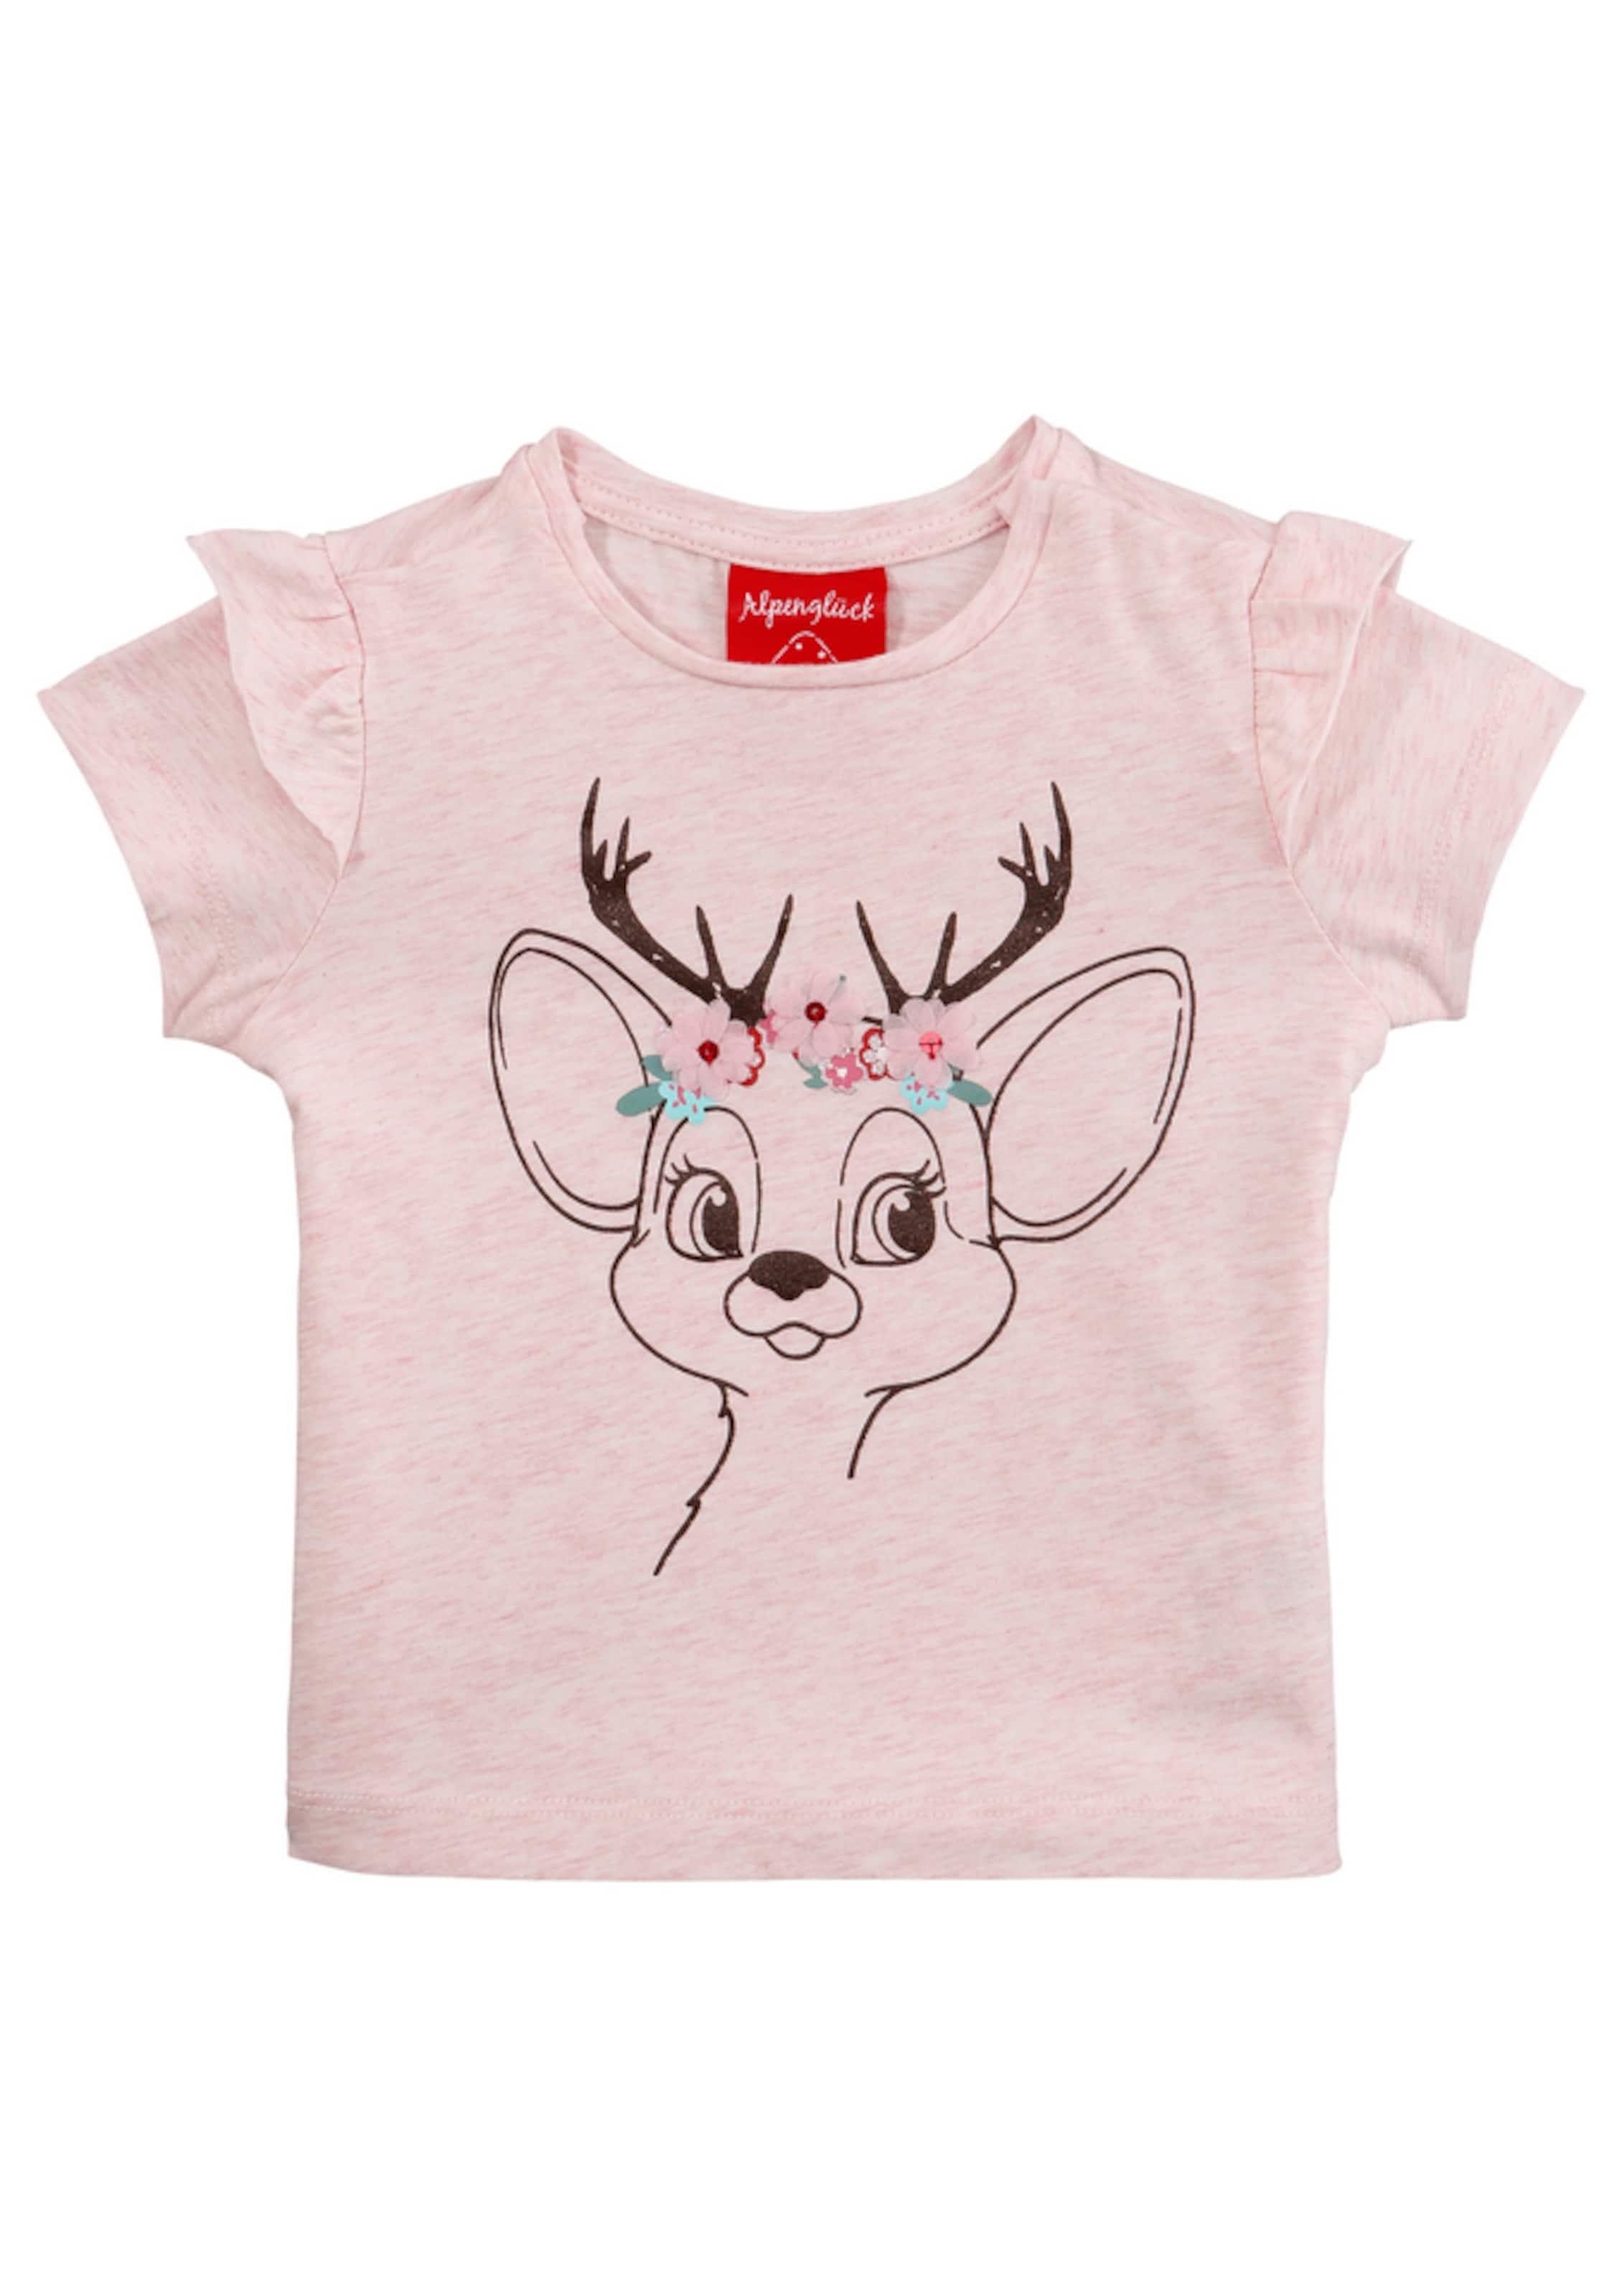 Kinder,  Mädchen,  Kinder BONDI Trachtenshirt in leichter A-Linen-Form rosa |